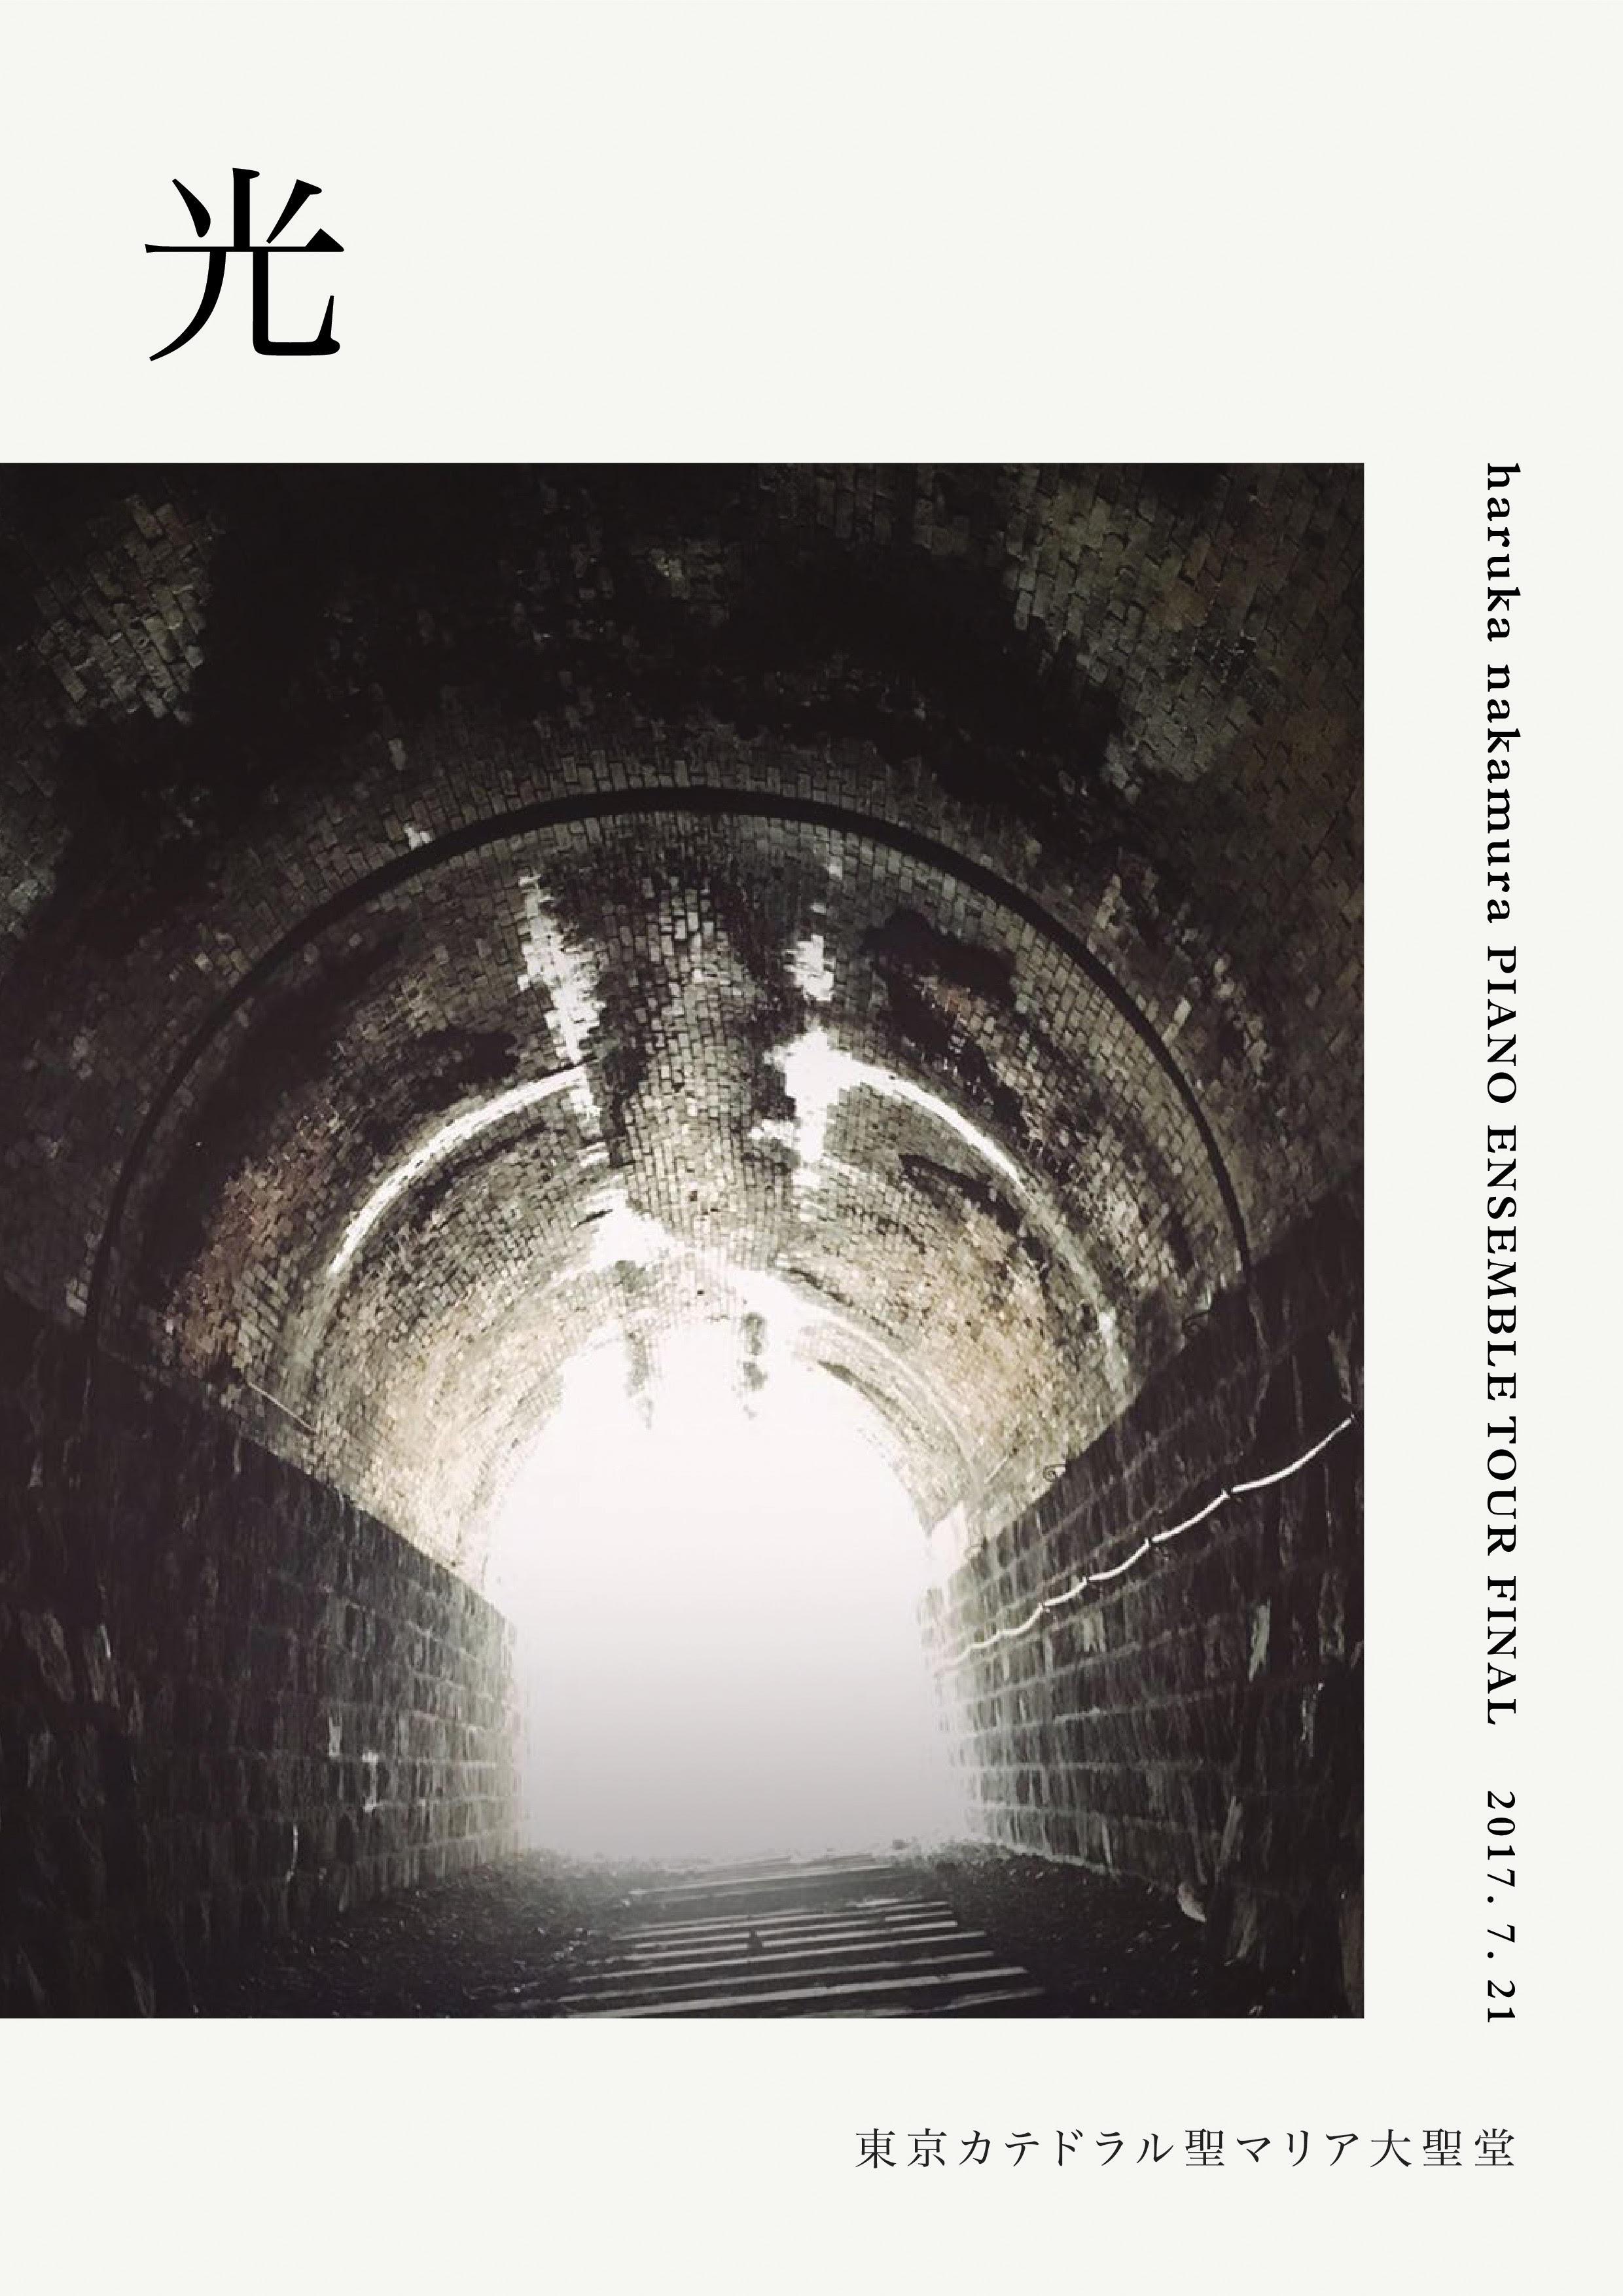 haruka nakamura PIANO ENSEMBLE TOUR FINAL「光」